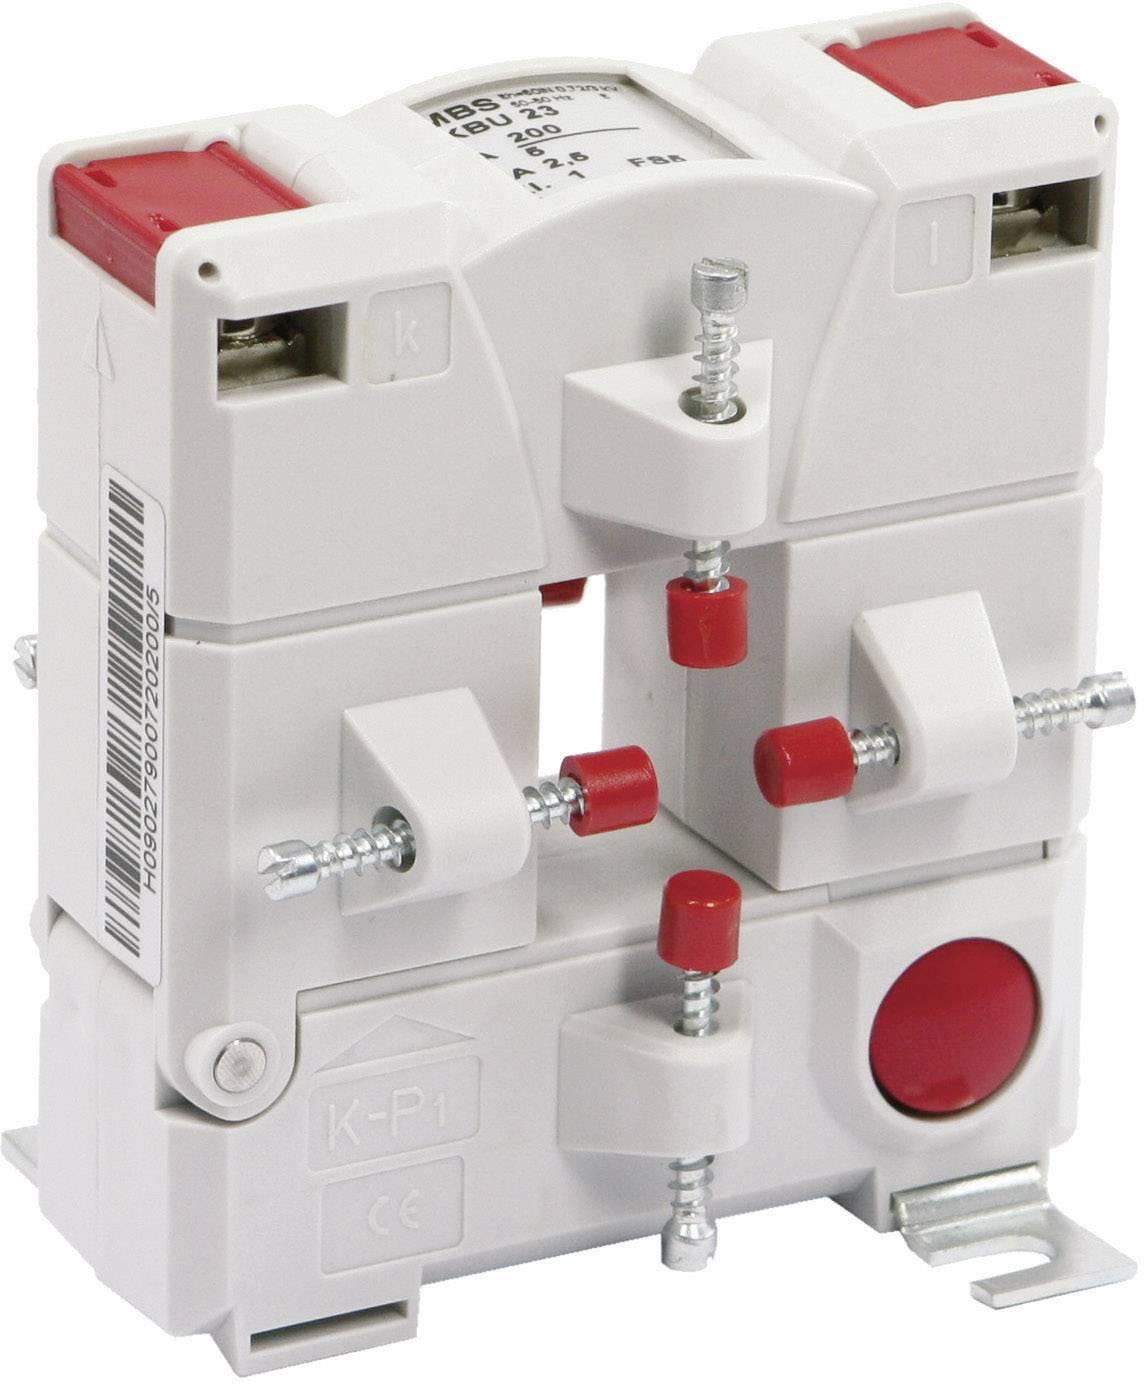 Zásuvný merací transformátor prúdu MBS KBU 23 250/5 A 1,5 VA Kl.1